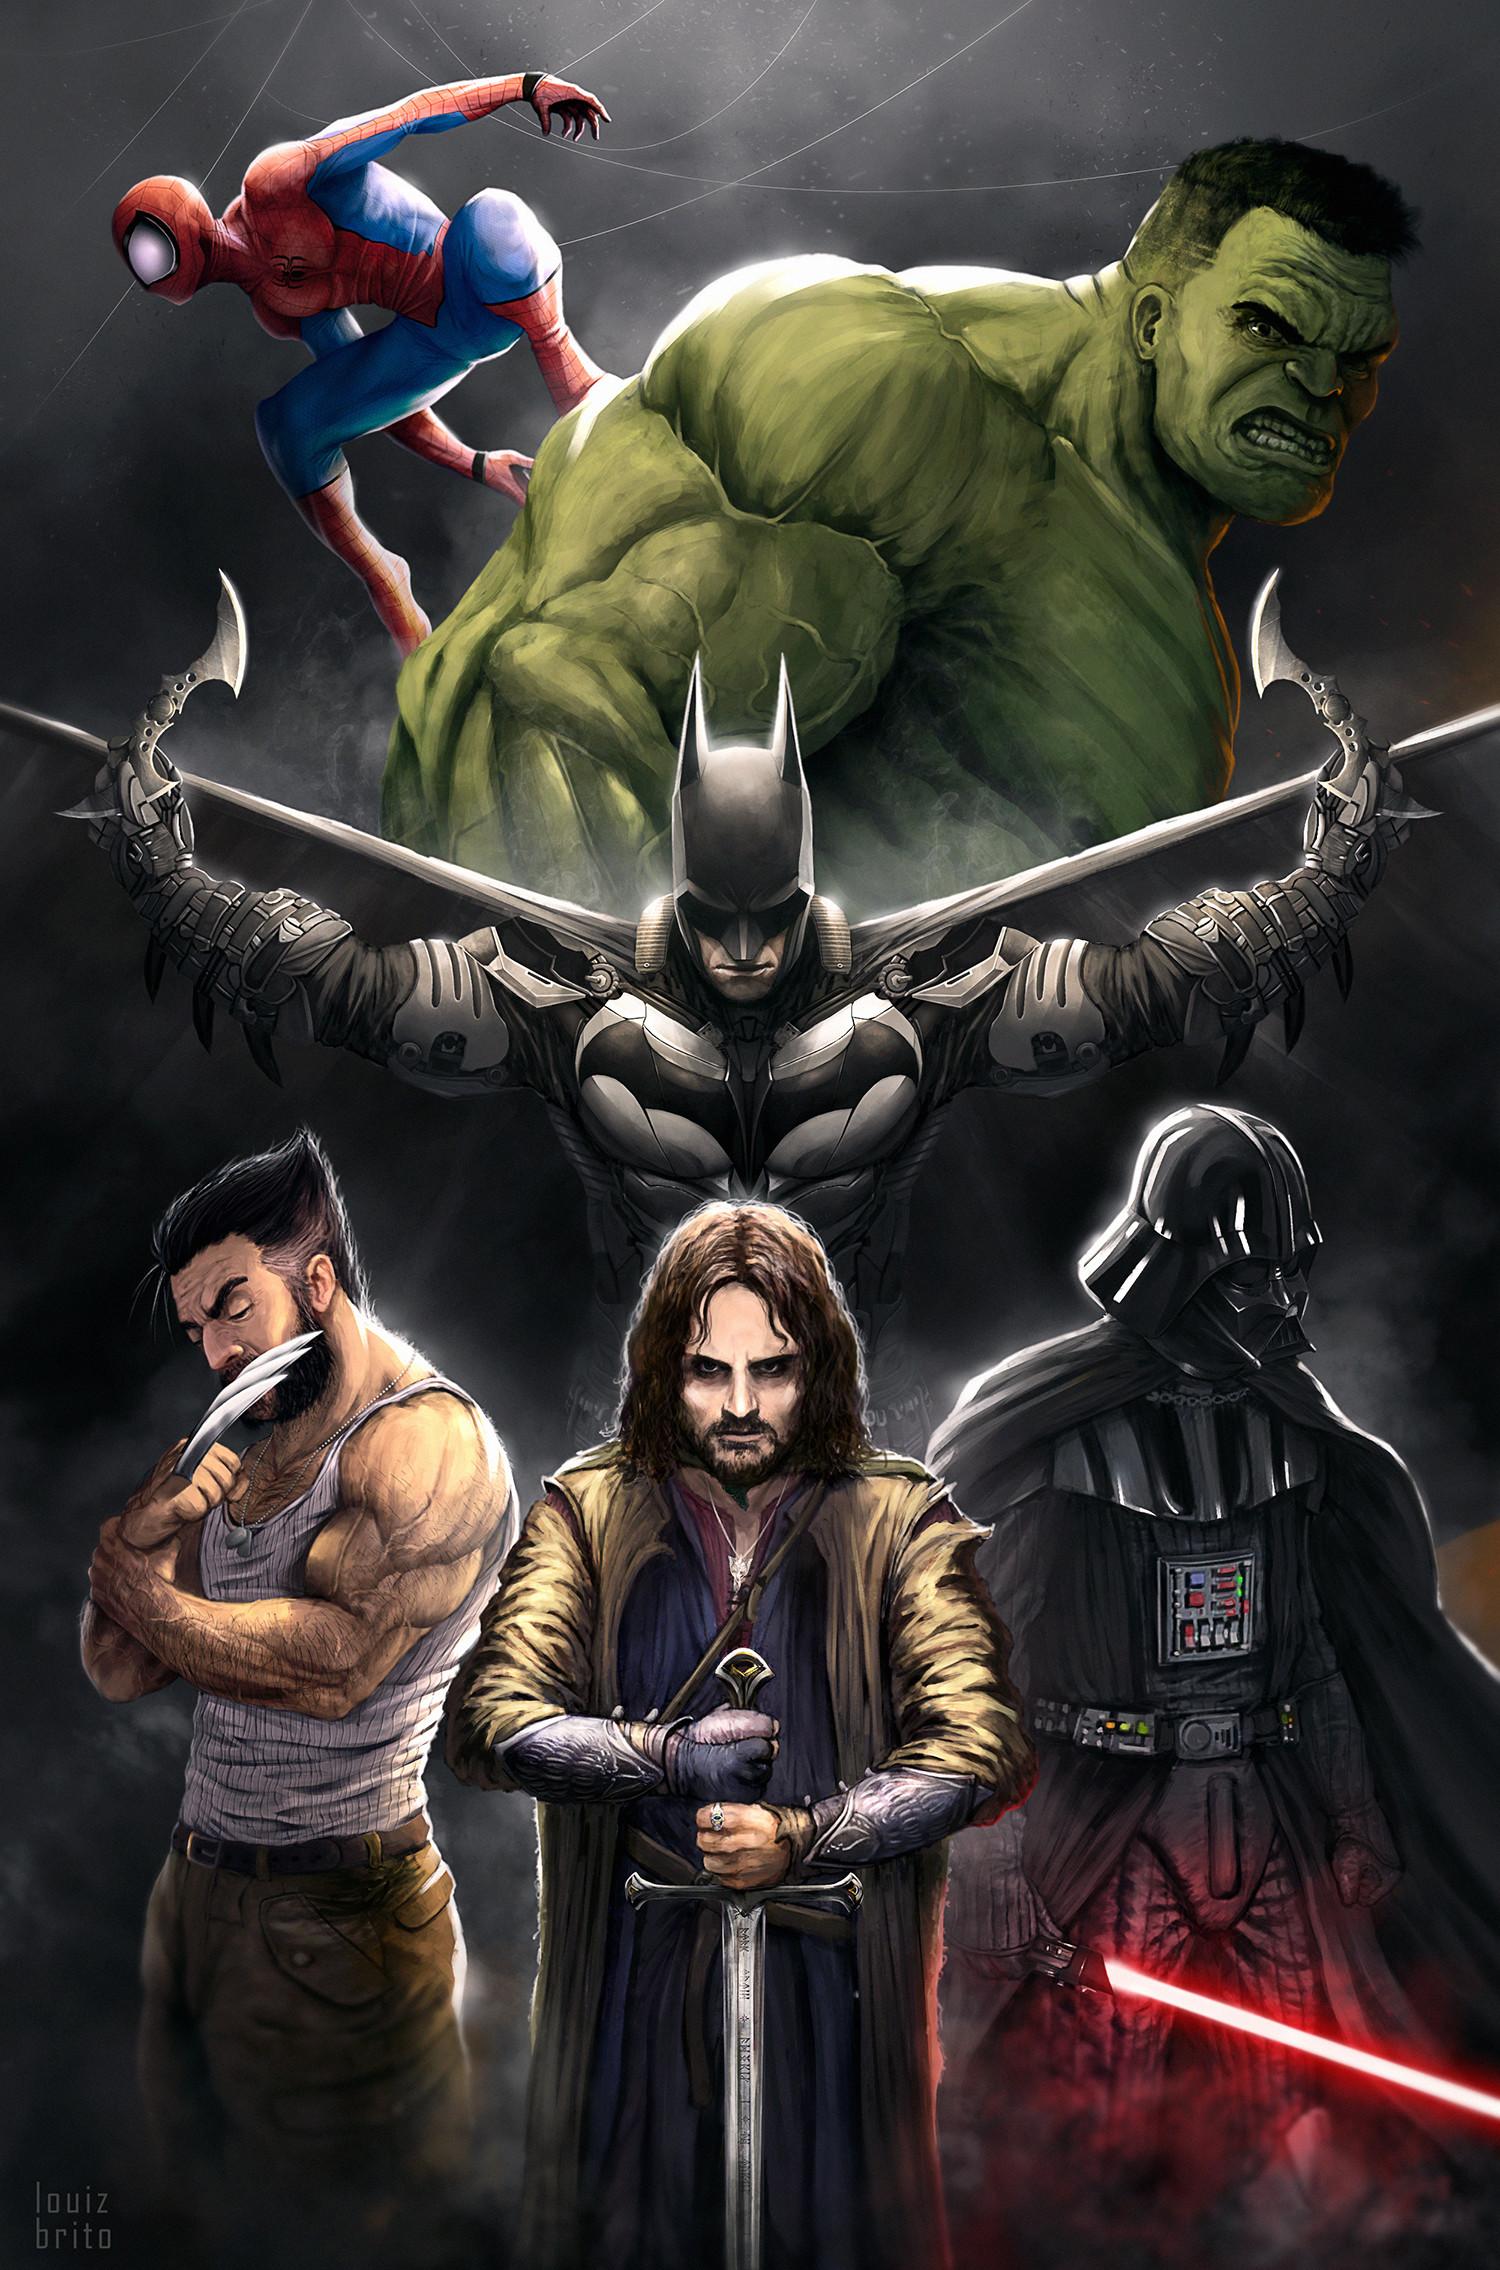 Wallpaper Marvel Comics Spider Man Wolverine Hulk Dc Comics Batman Star Wars The Lord Of The Rings Aragorn Darth Vader X Men 1500x2270 Emrakyz61 1442609 Hd Wallpapers Wallhere